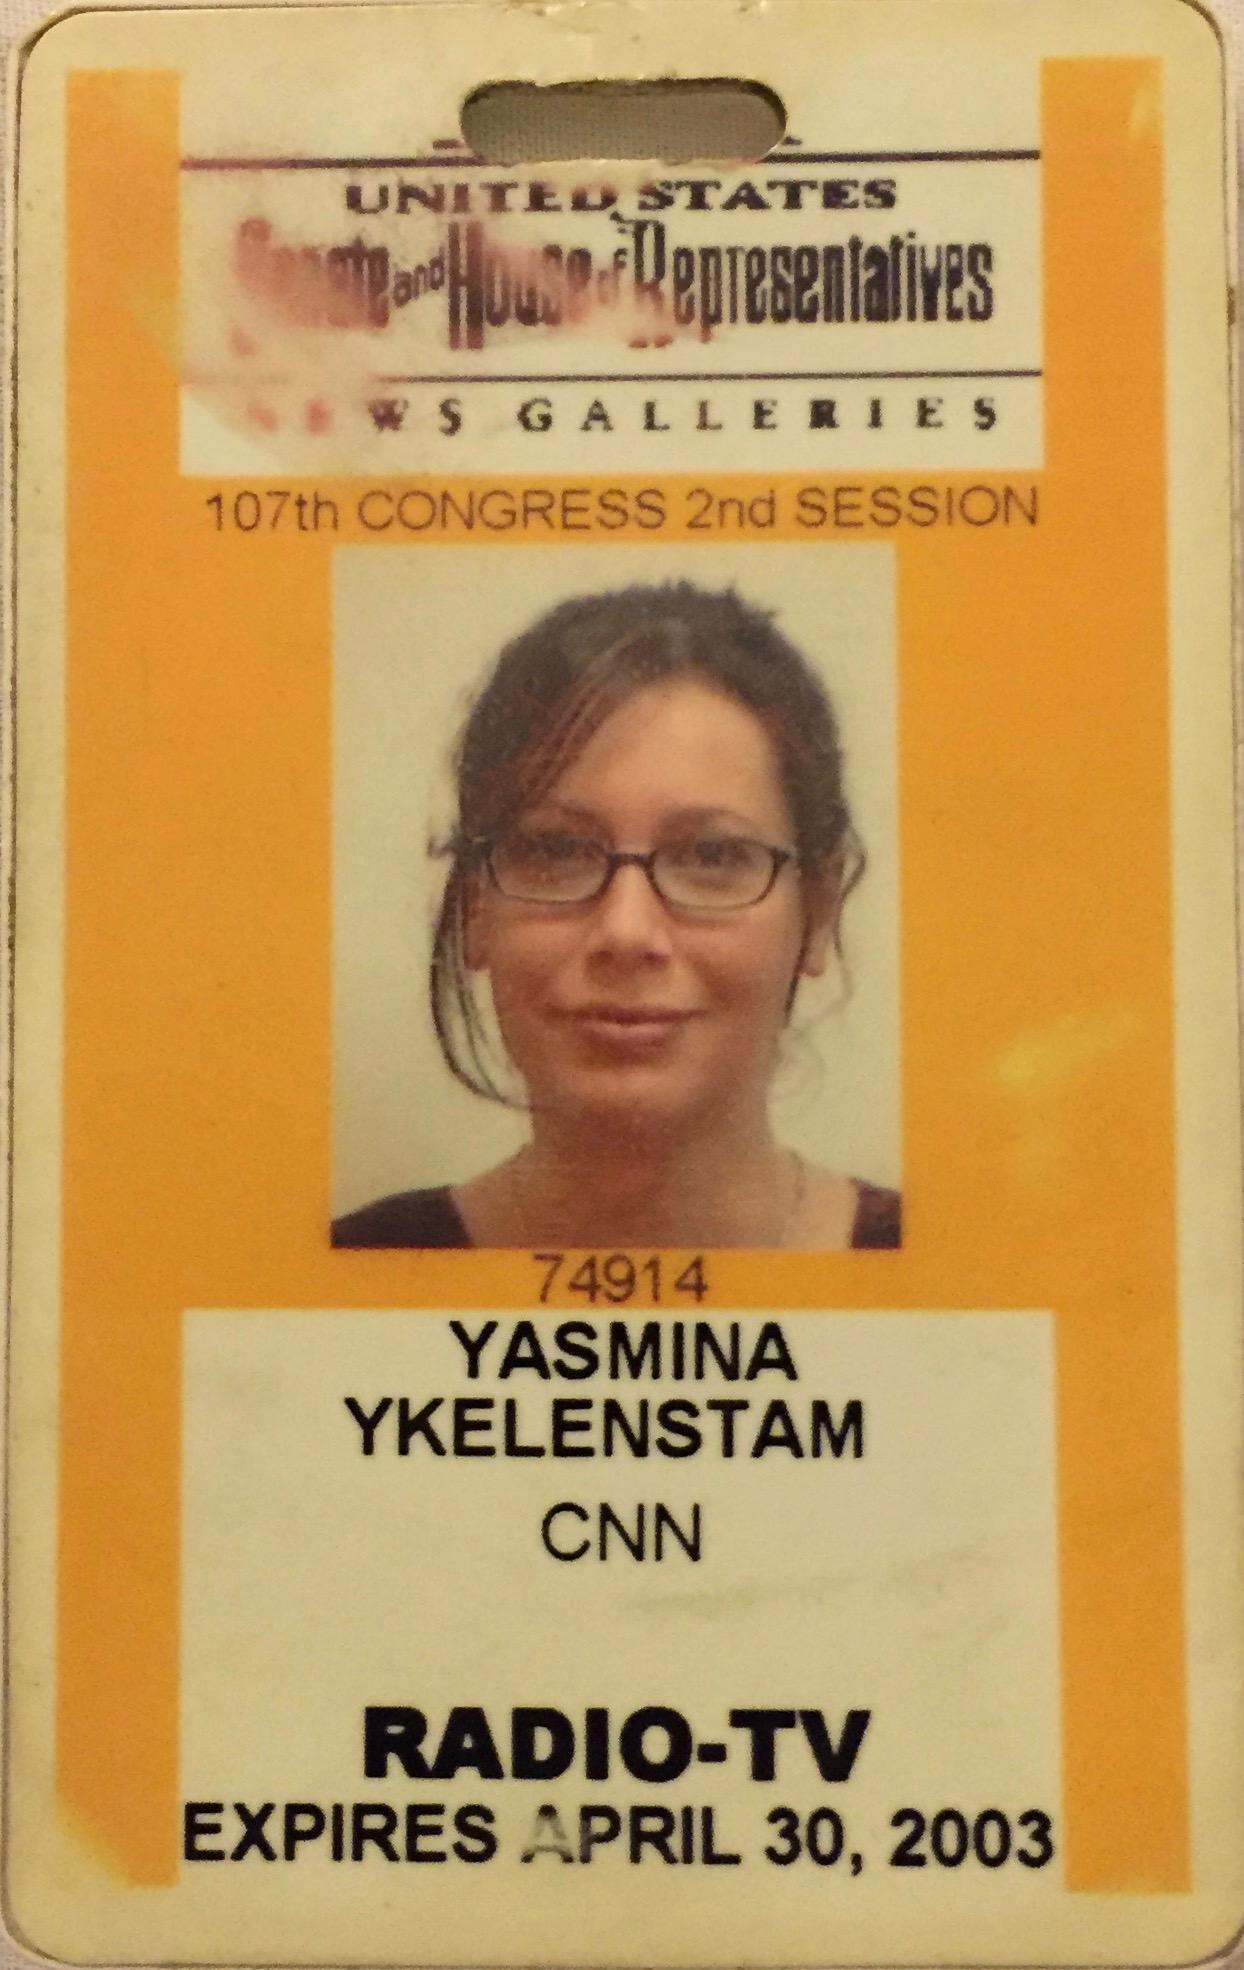 My Washington DC CNN press pass